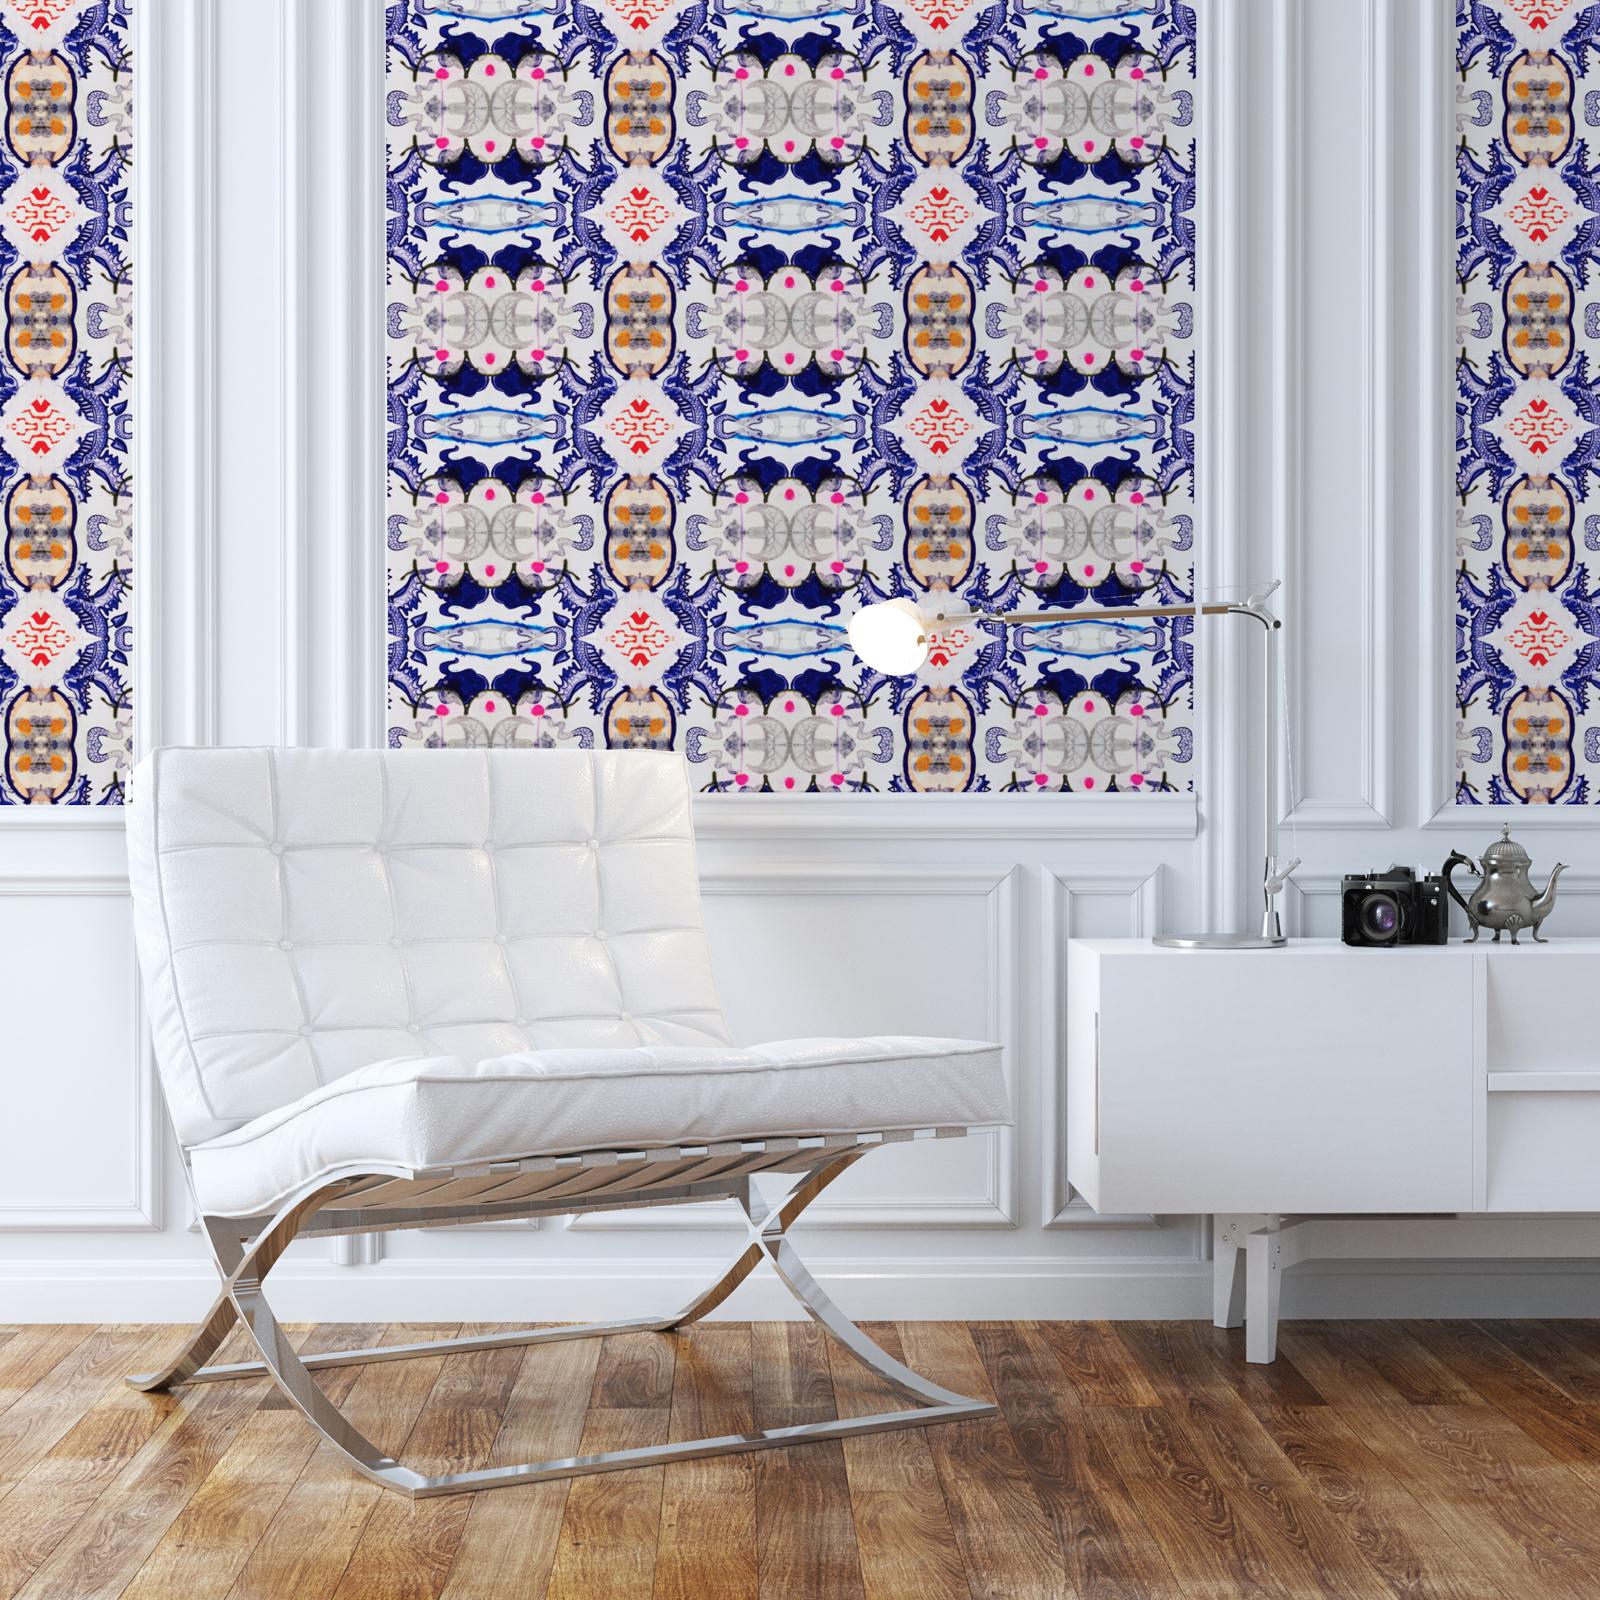 How To Hang Wallpaper Kristi Kohut Studio Kristi Kohut